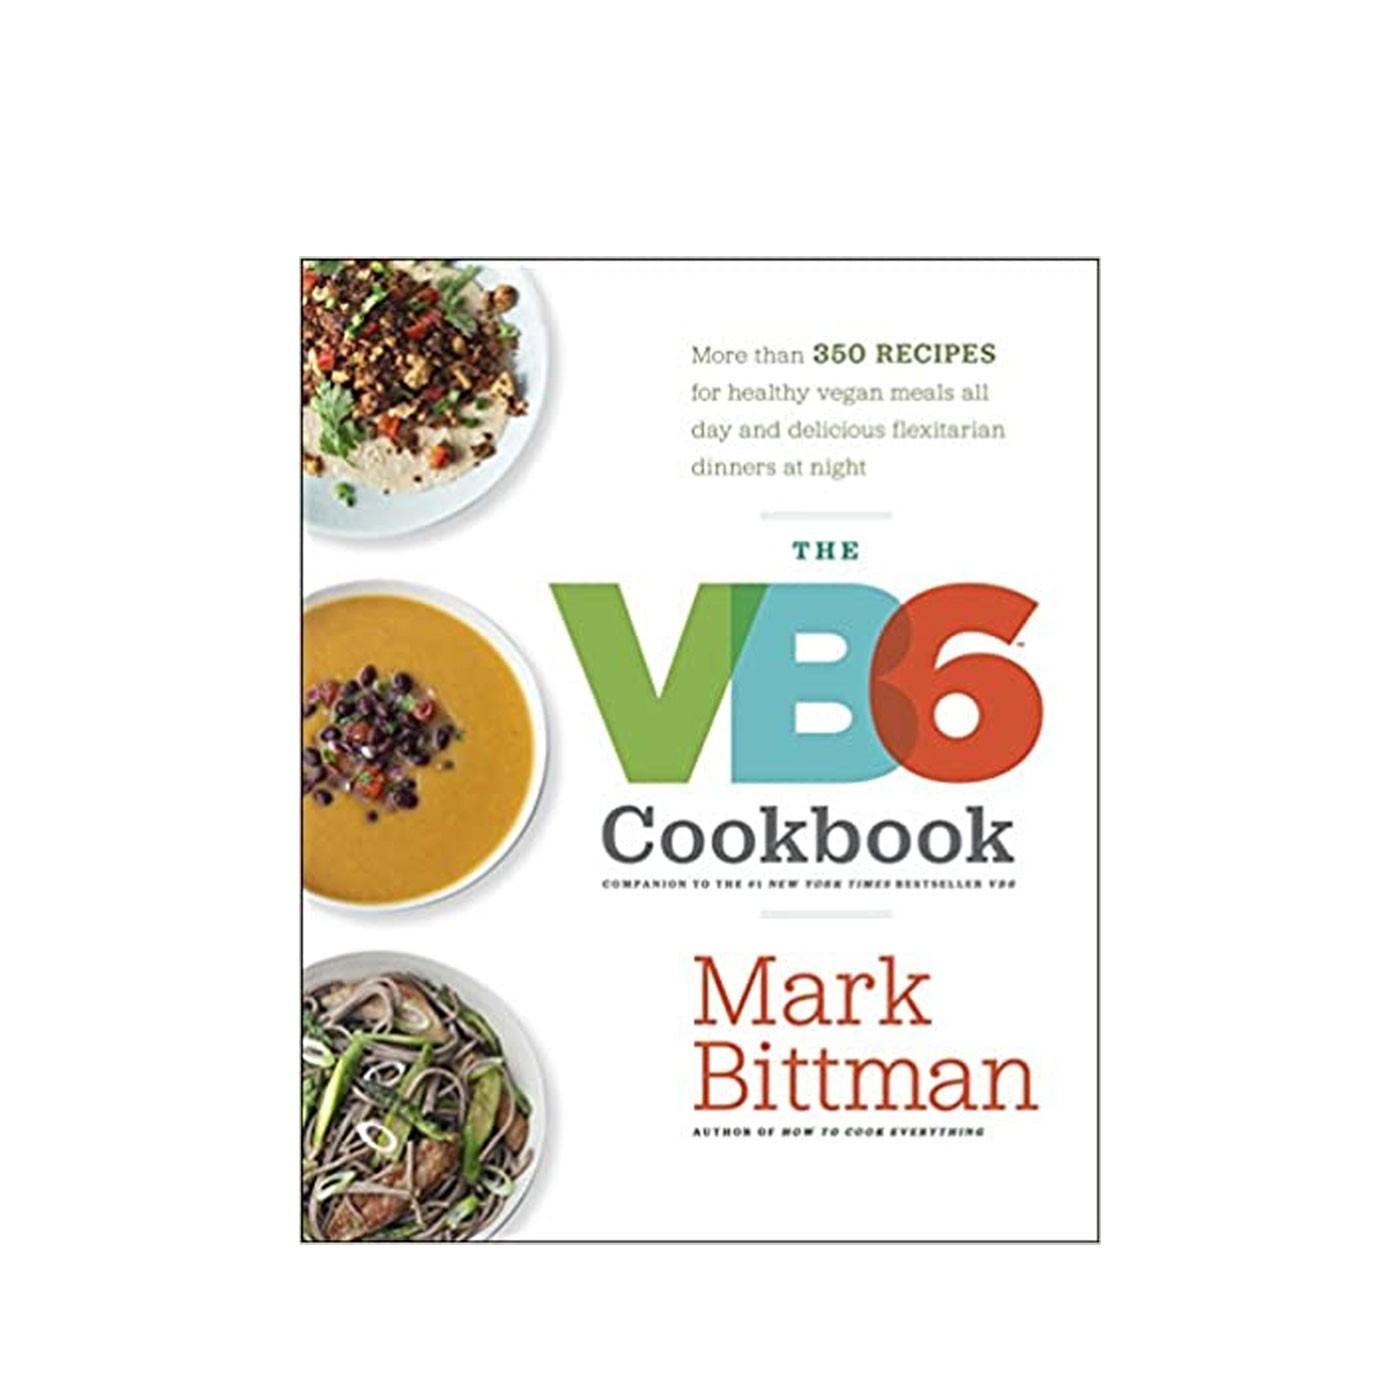 The VB6 Cookbook